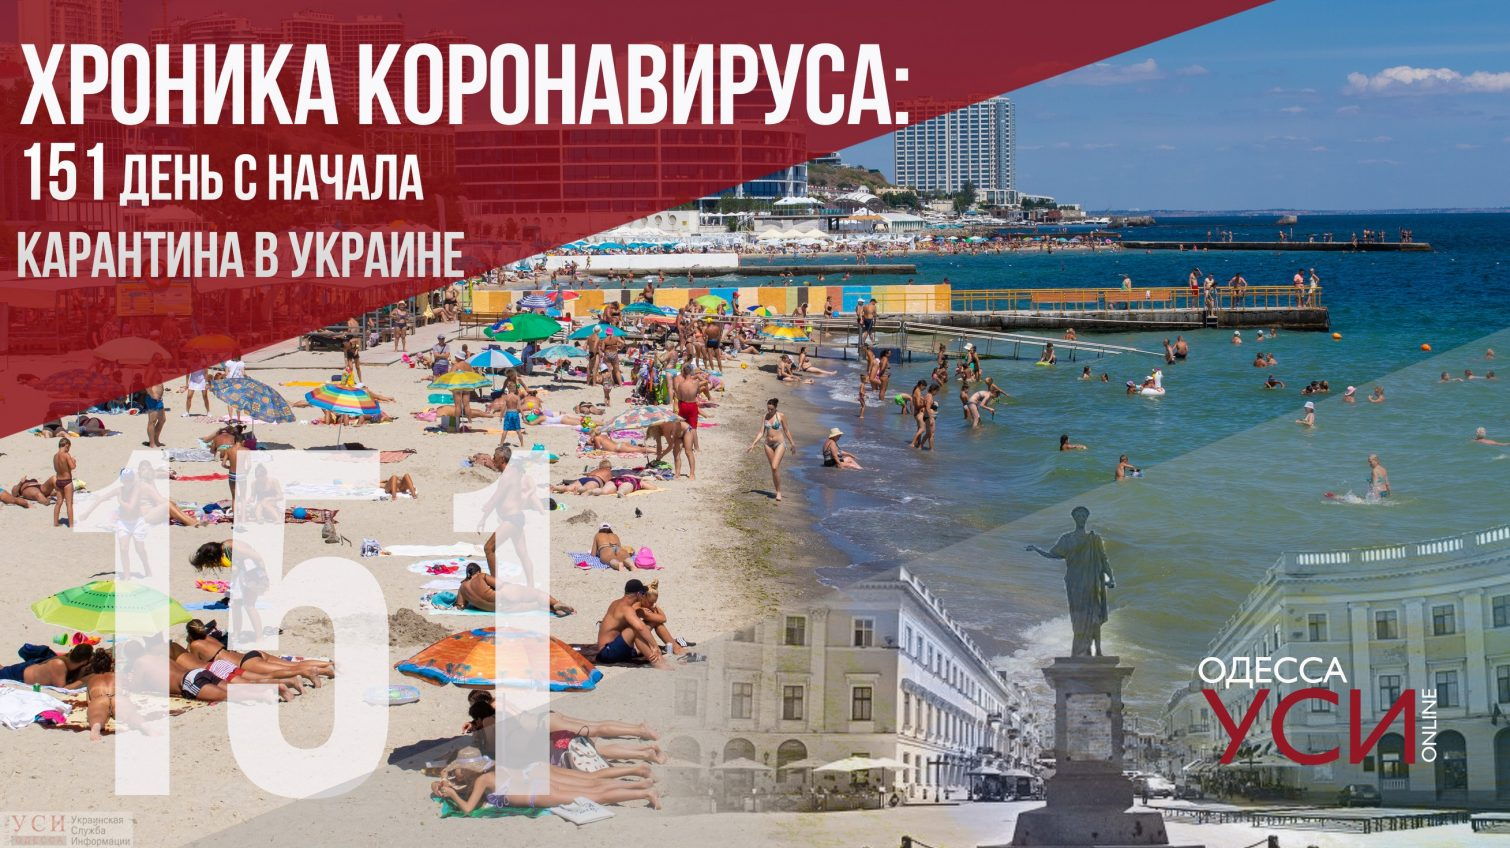 Хроника коронавируса: 151 день с начала карантина в Украине «фото»